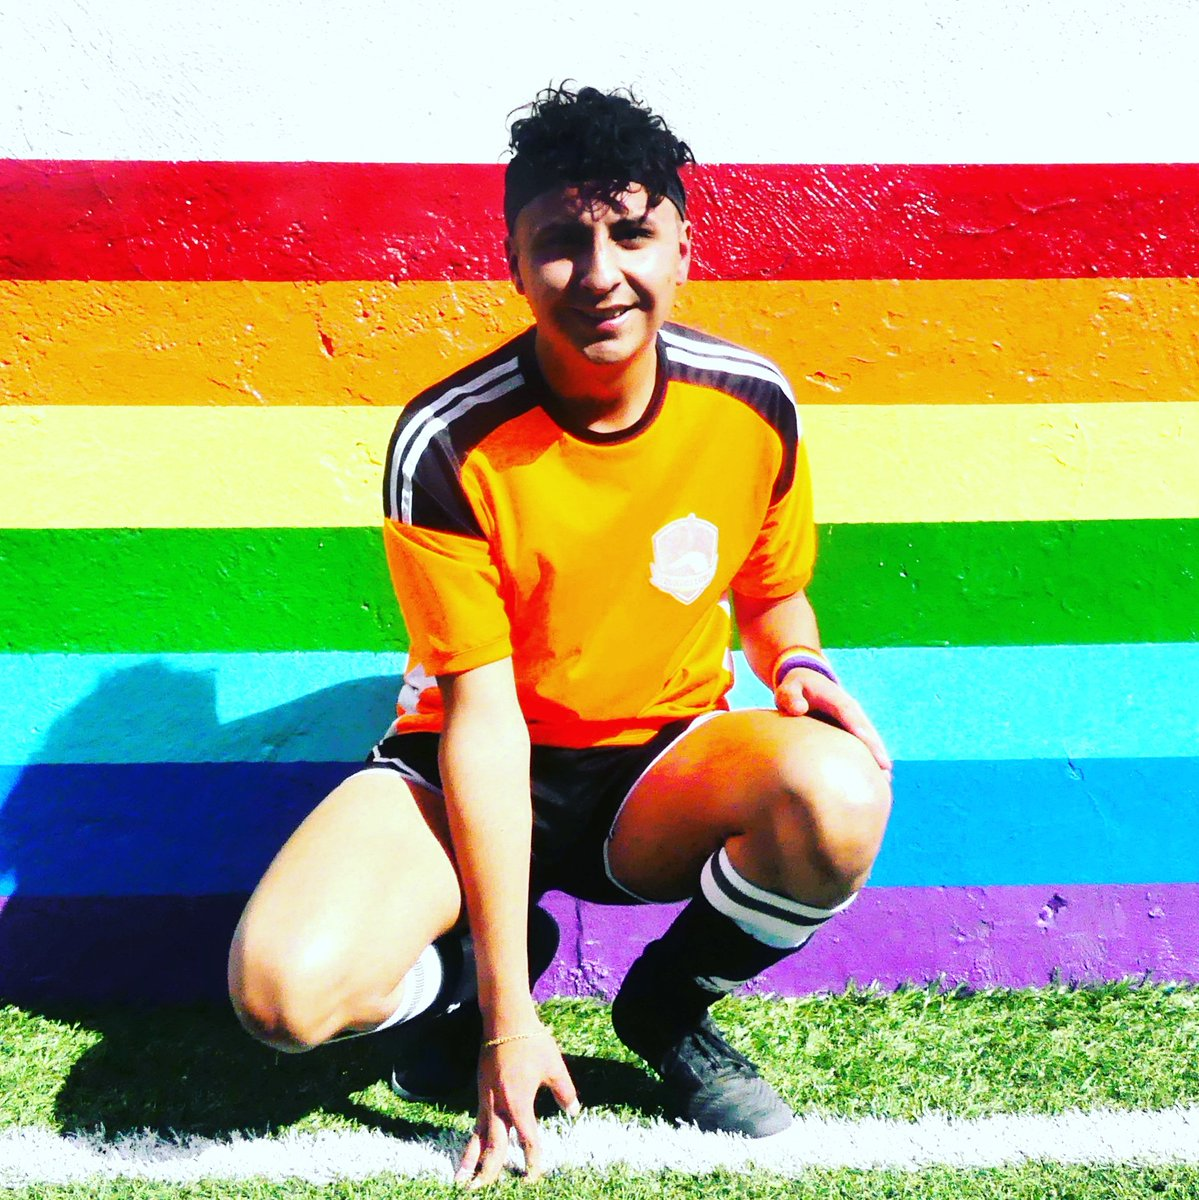 Luis Posición: Medio / Defensa  Equipo: Zorros Dorados  #DeporteLGBT #LGBTSports #FutbolLGBT #ZorrosLGBT #OrgulloDeportivo #instagay #gaysports #gayfutbol #gayboy #futbolgaypic.twitter.com/Bissokk2lh